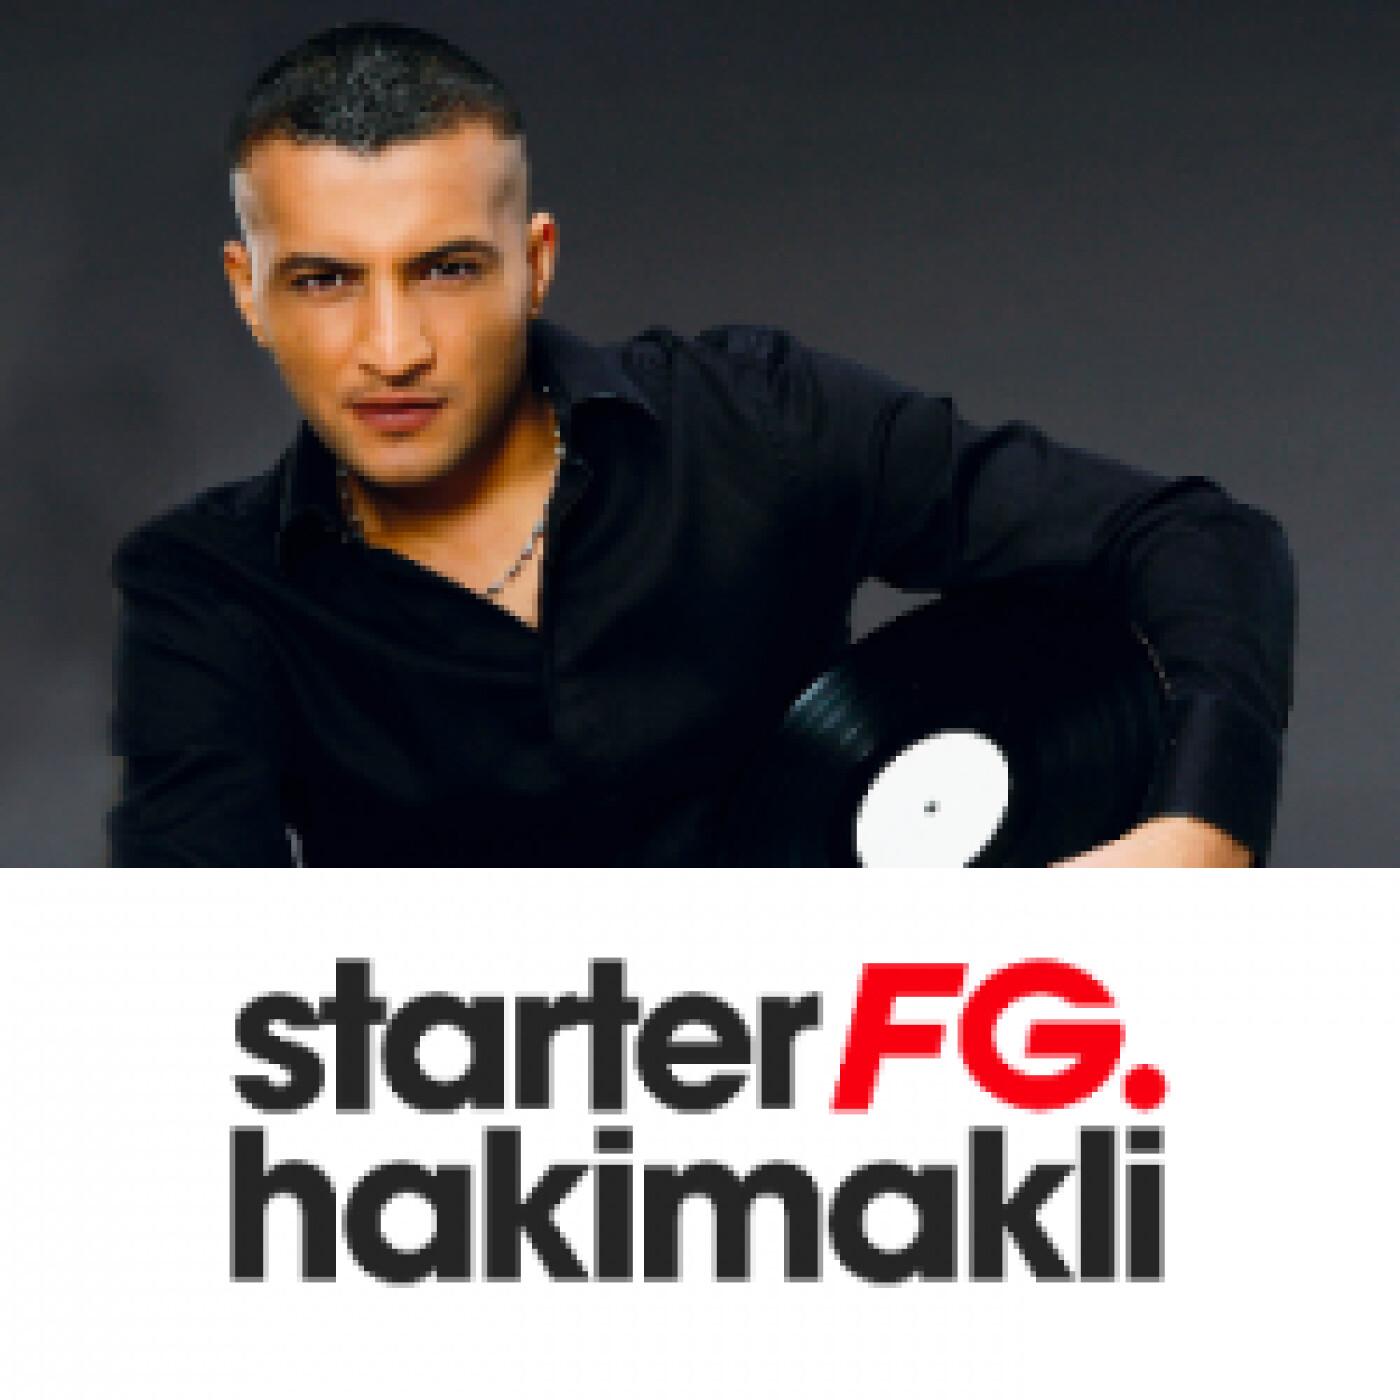 STARTER FG BY HAKIMAKLI MARDI 26 JANVIER 2021